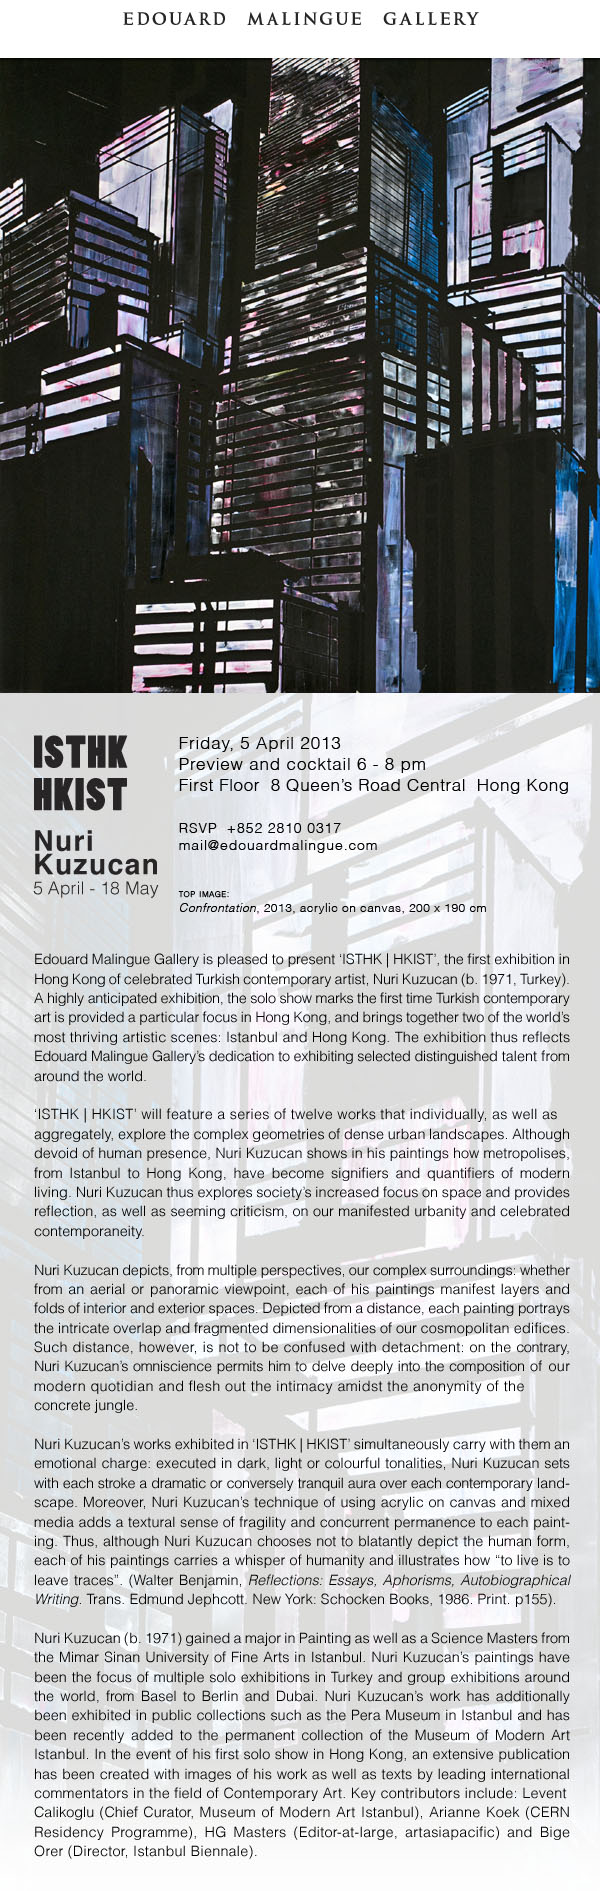 Nuri Kuzucan ISTHK | HKIST Preview - April 5